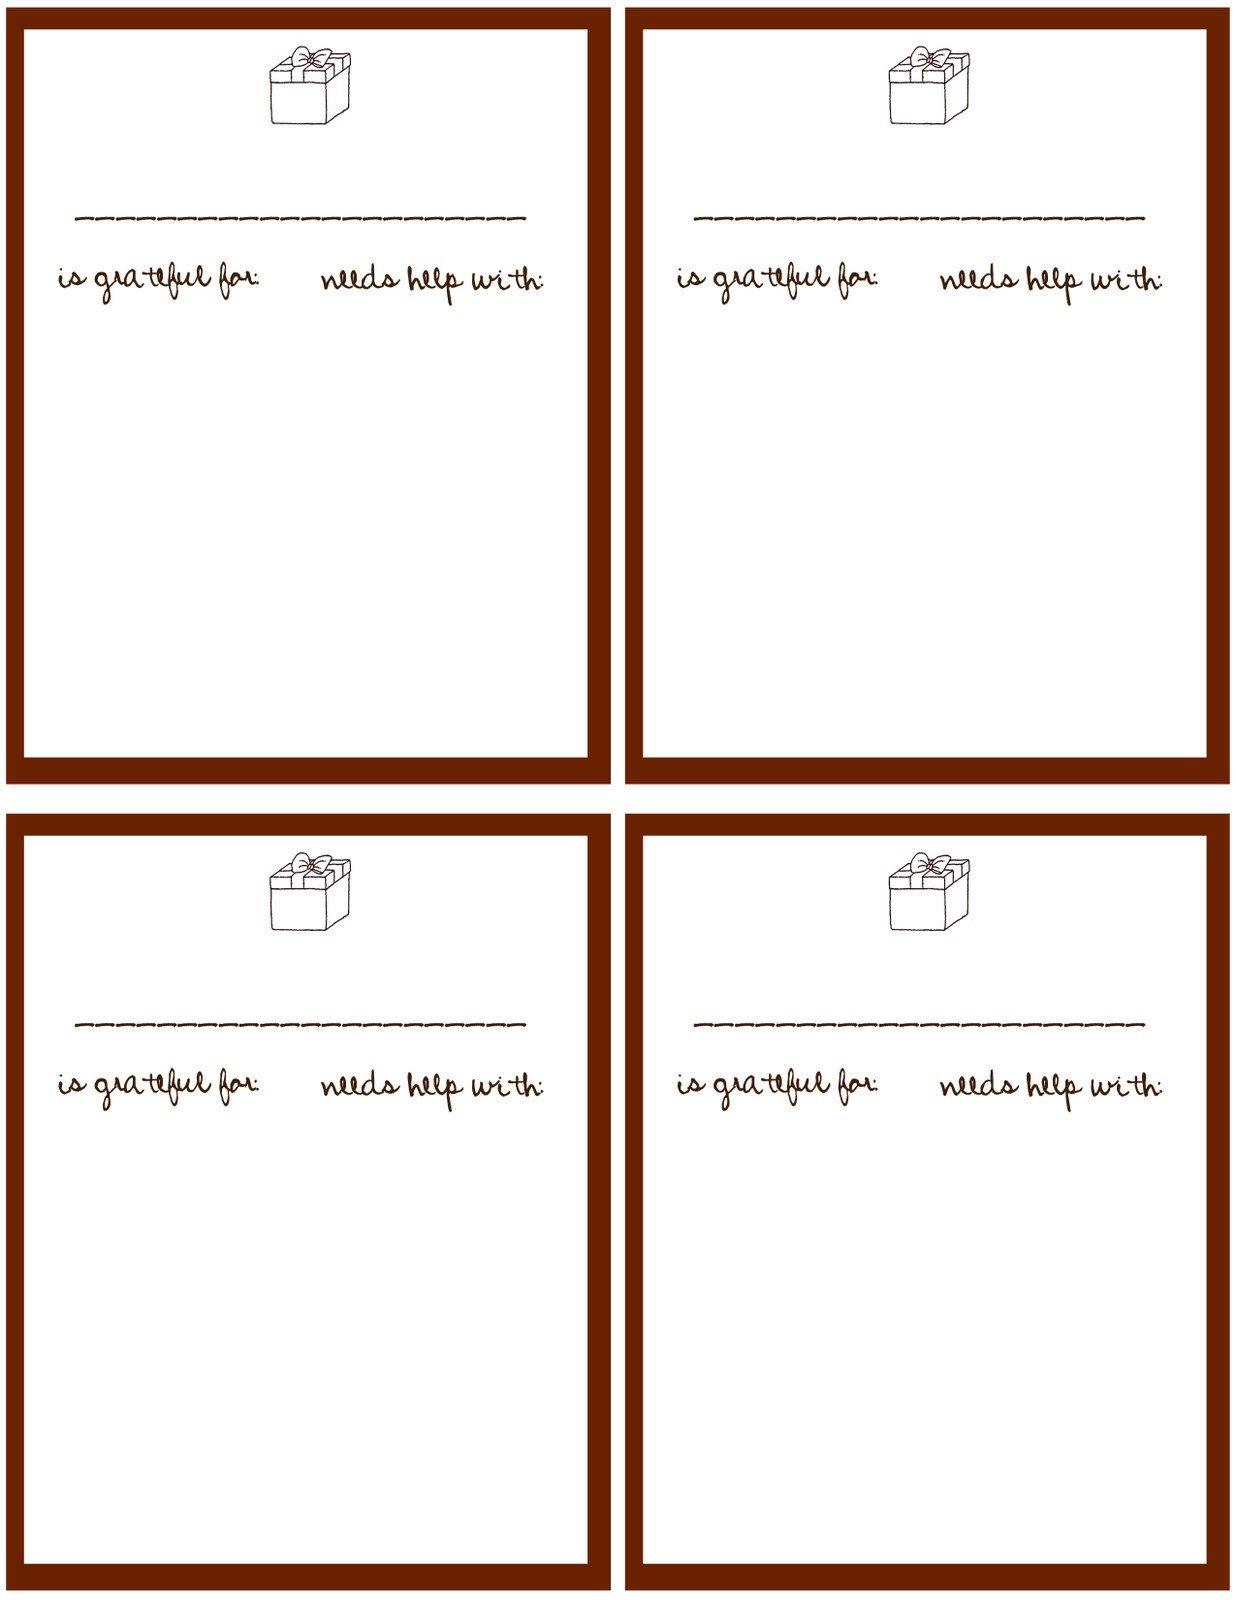 Prayer Card Template Free Amber S Notebook Daily Prayer Cards Printable